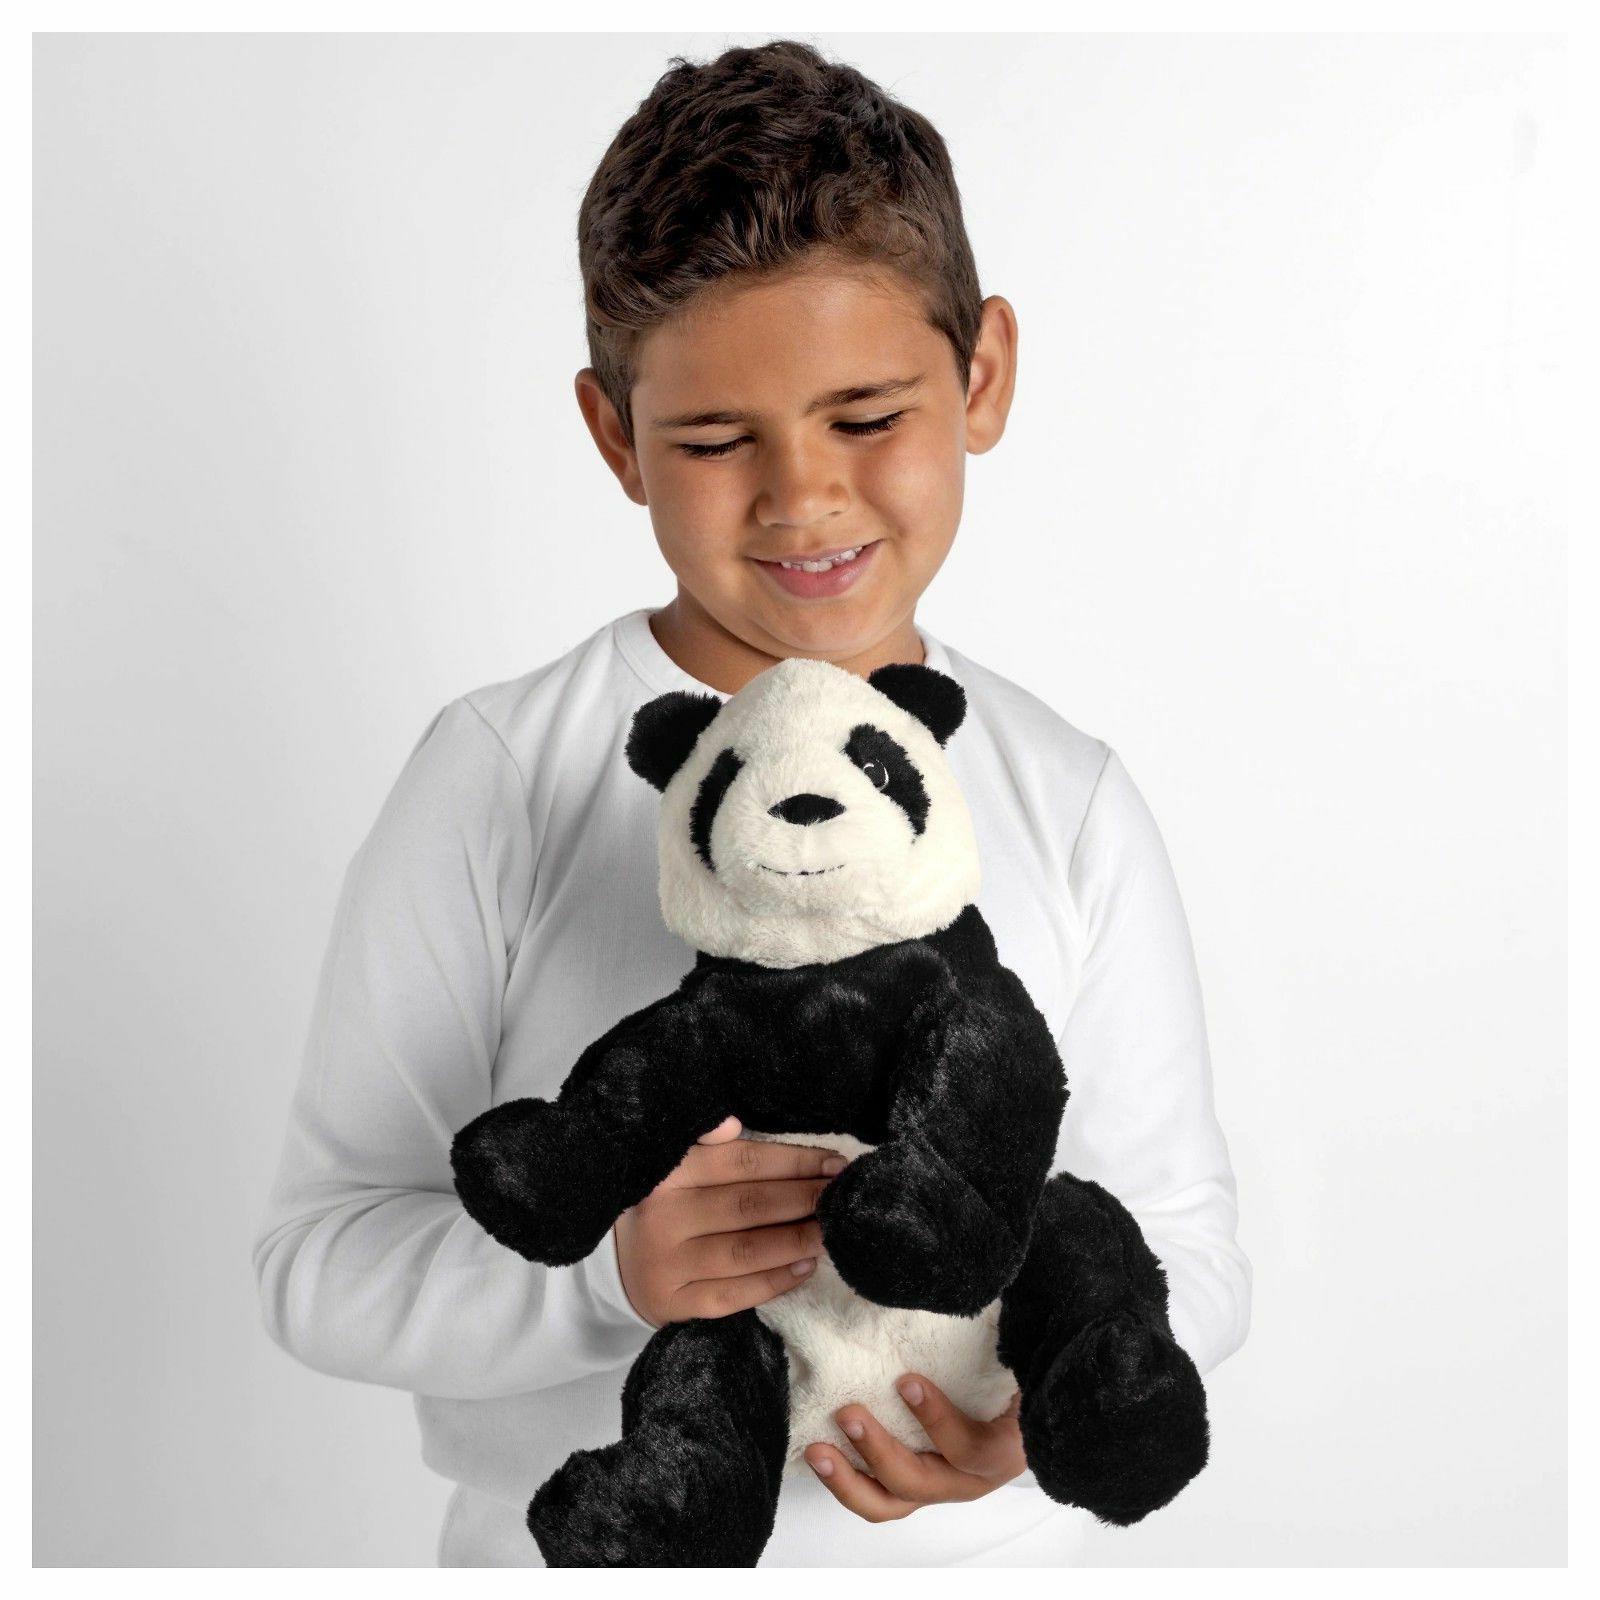 kramig panda teddy bear stuffed animal plush